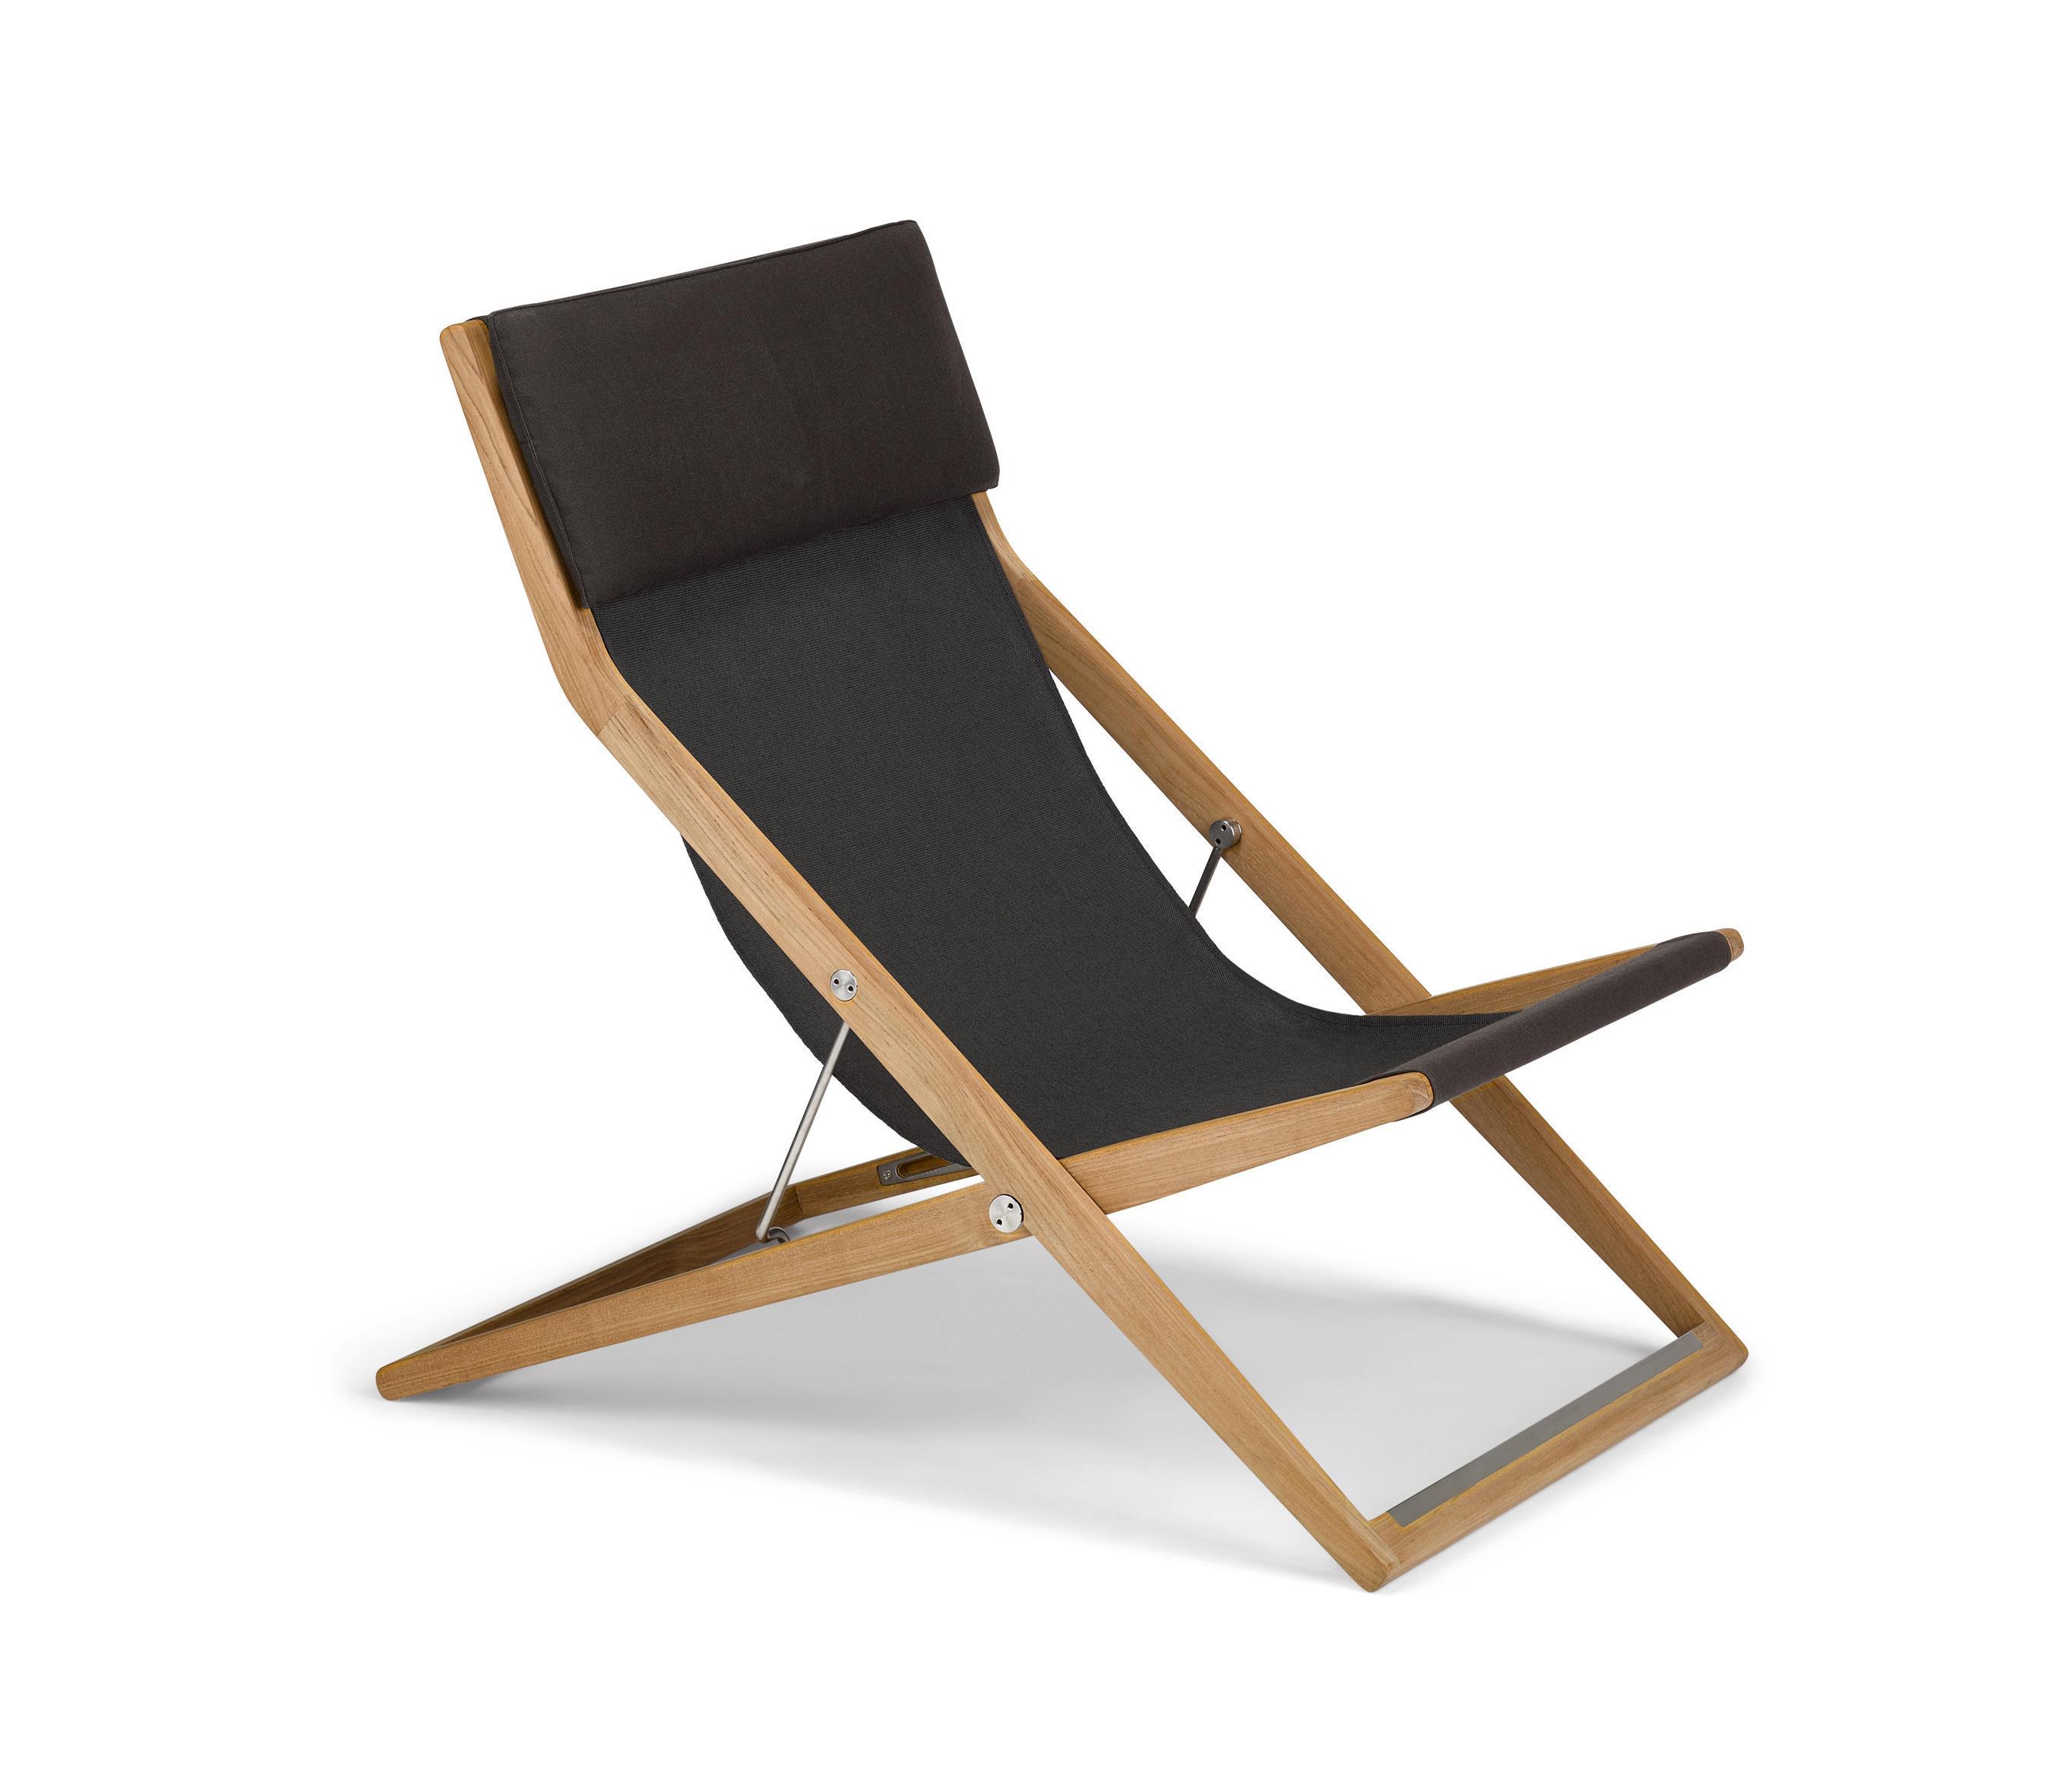 oknws folding lounge madrid com chair chaise